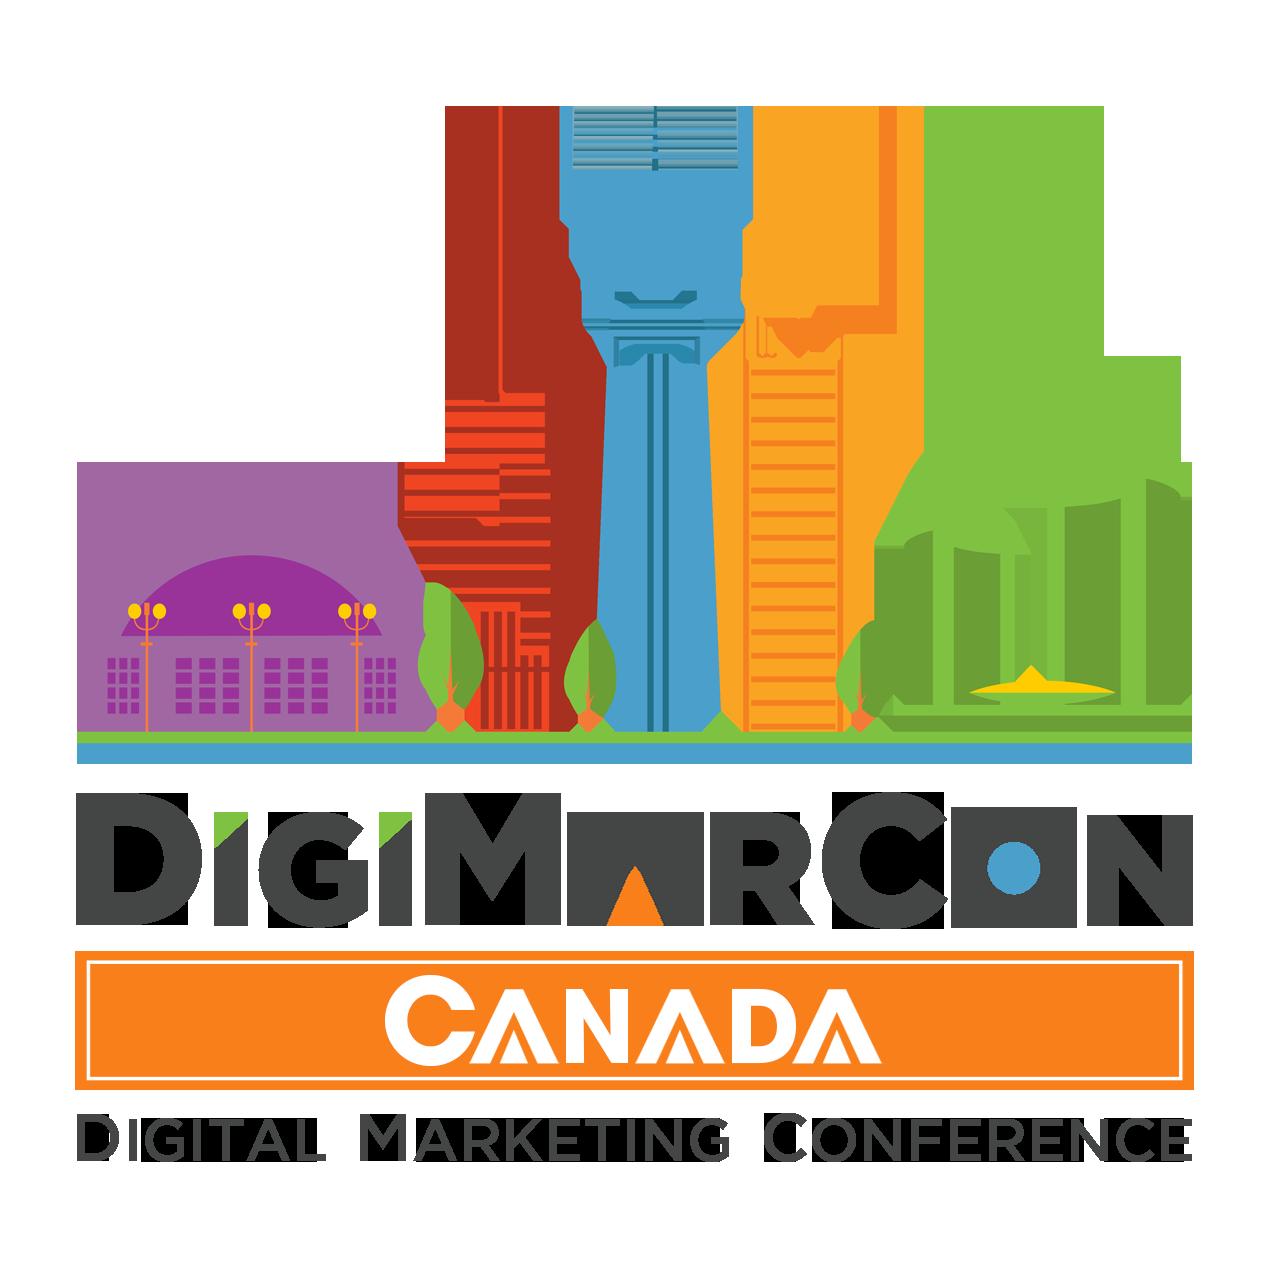 DigiMarCon Canada 2022 – Digital Marketing, Media and Advertising Conference & Exhibition